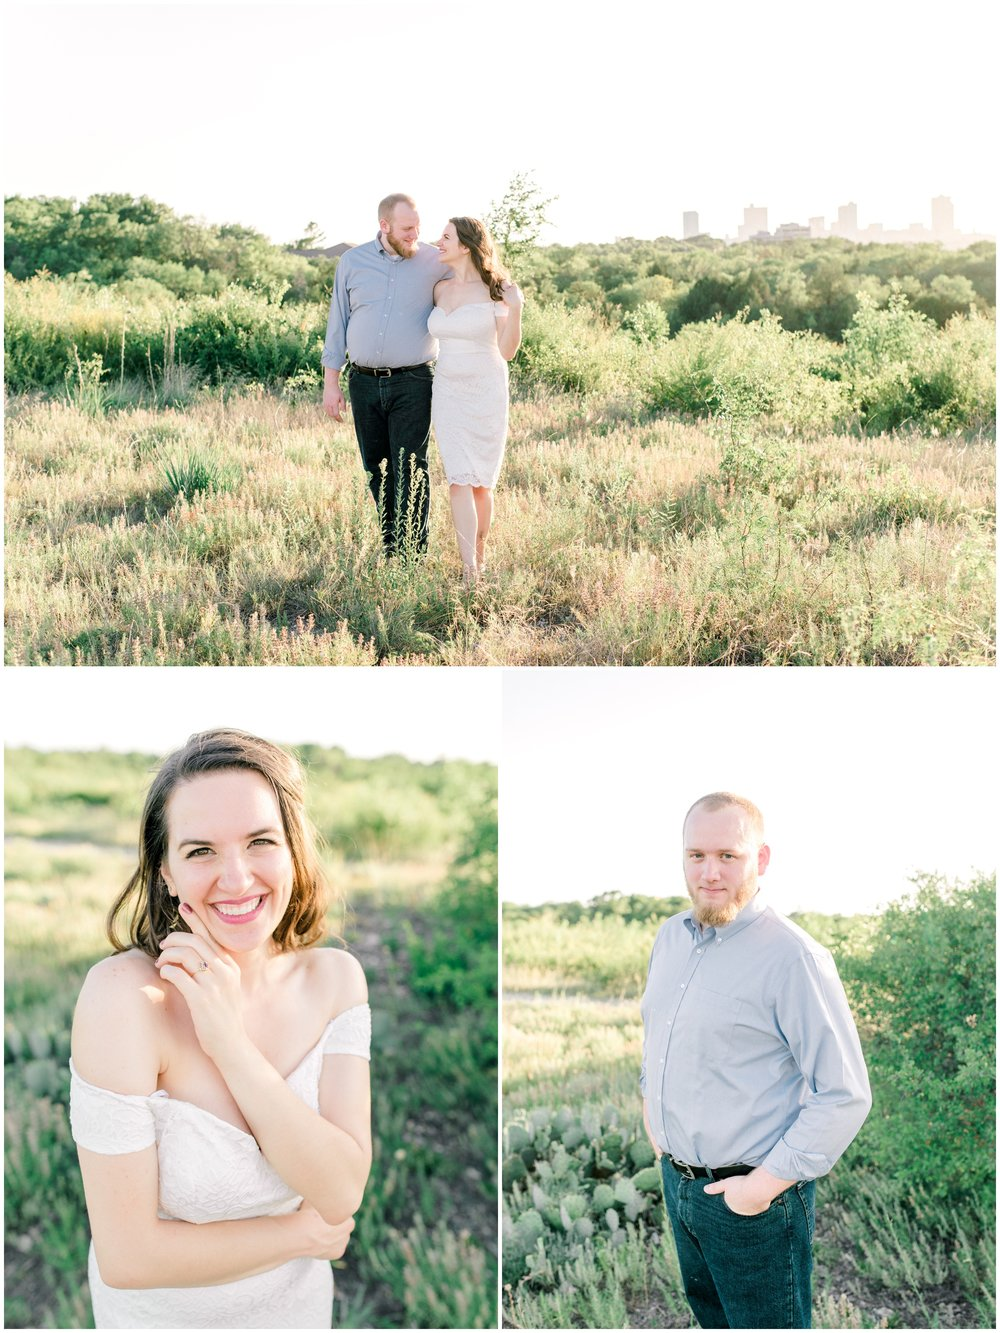 ChuaLeePhotography_DallasWeddingPhotographer_TandyHillsNaturalArea_0032.jpg